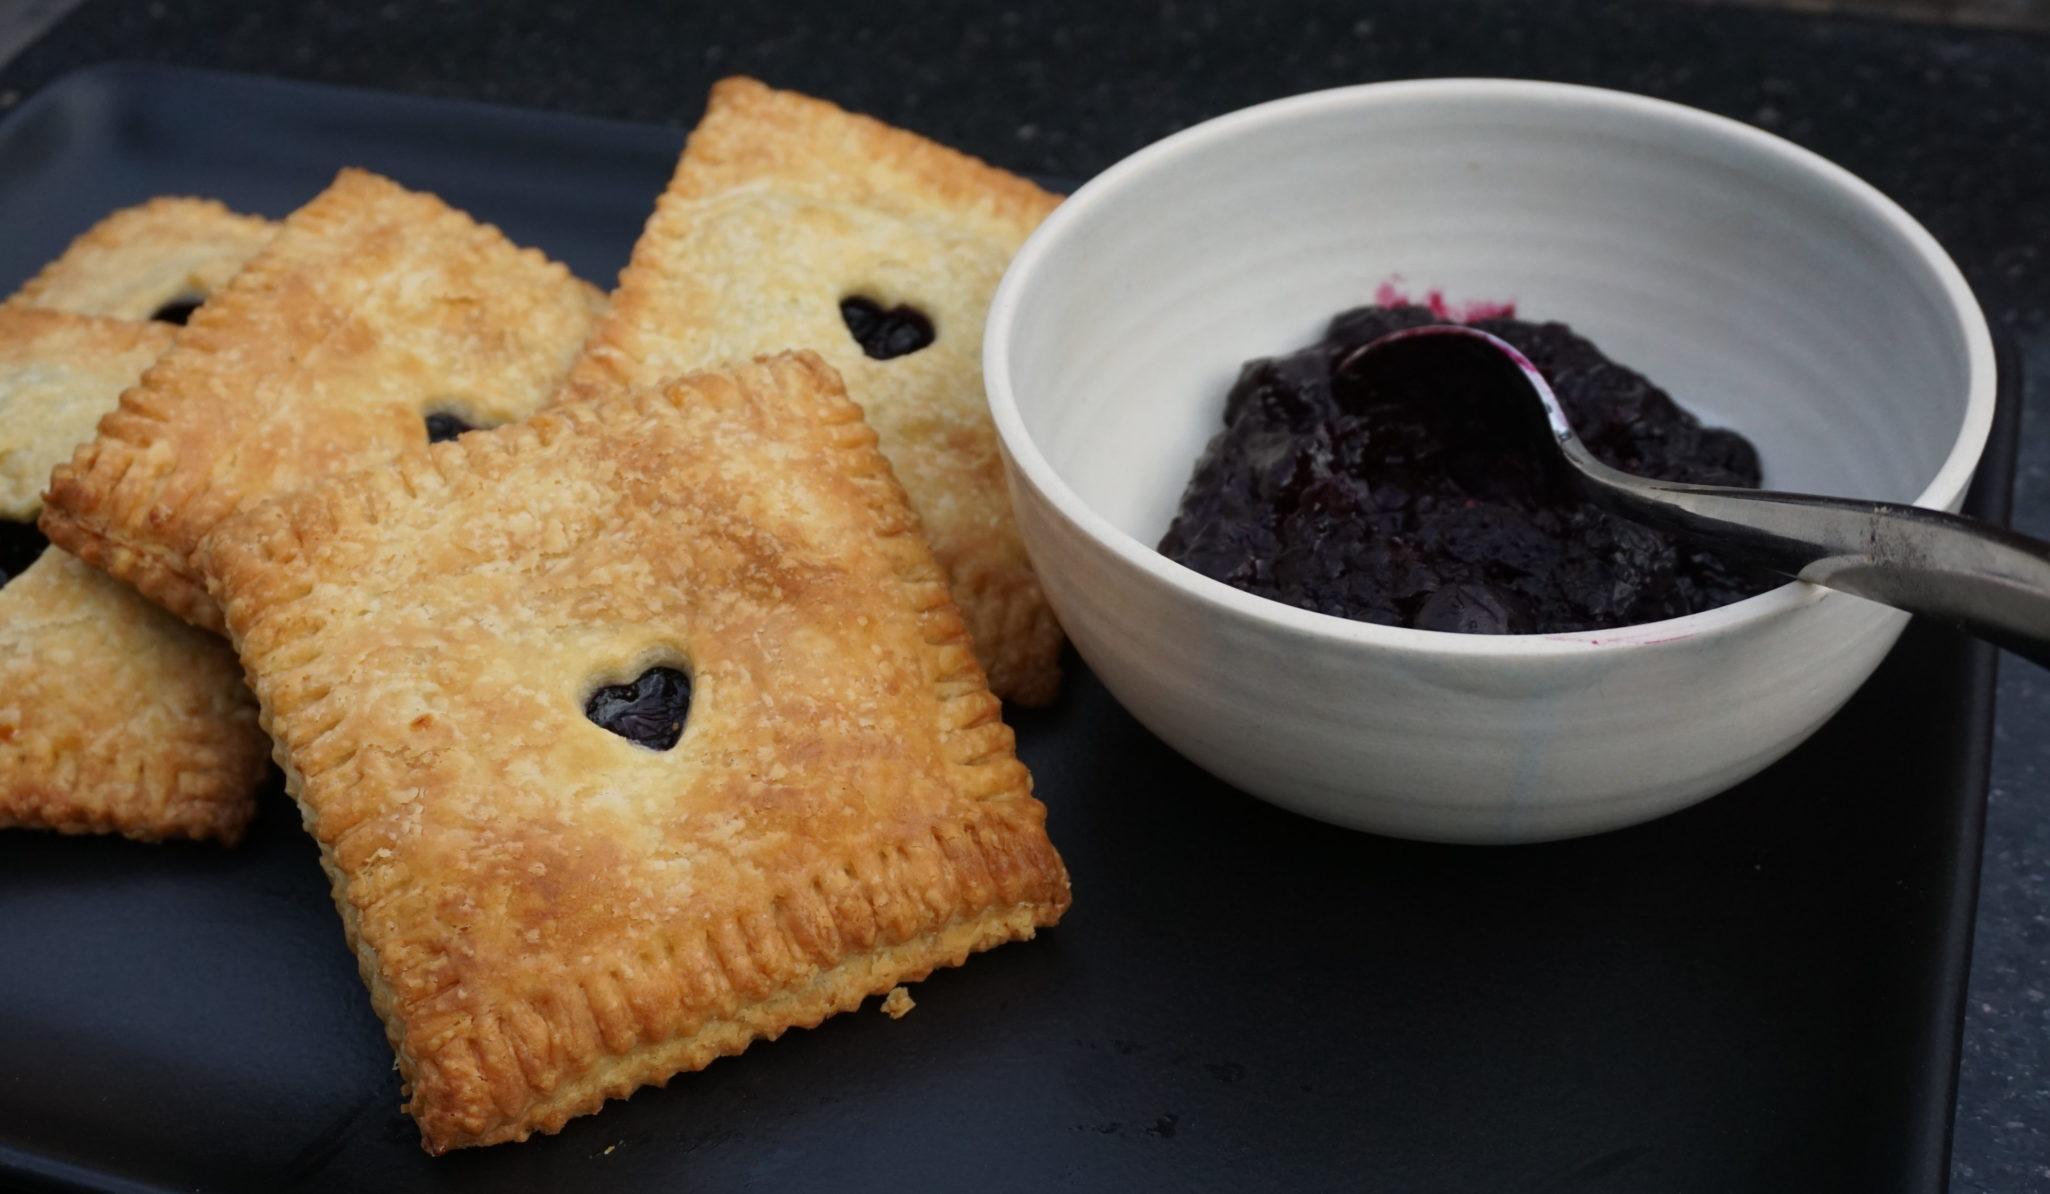 Girls Just Wanna Have Pie (Blueberry Hand Pies)